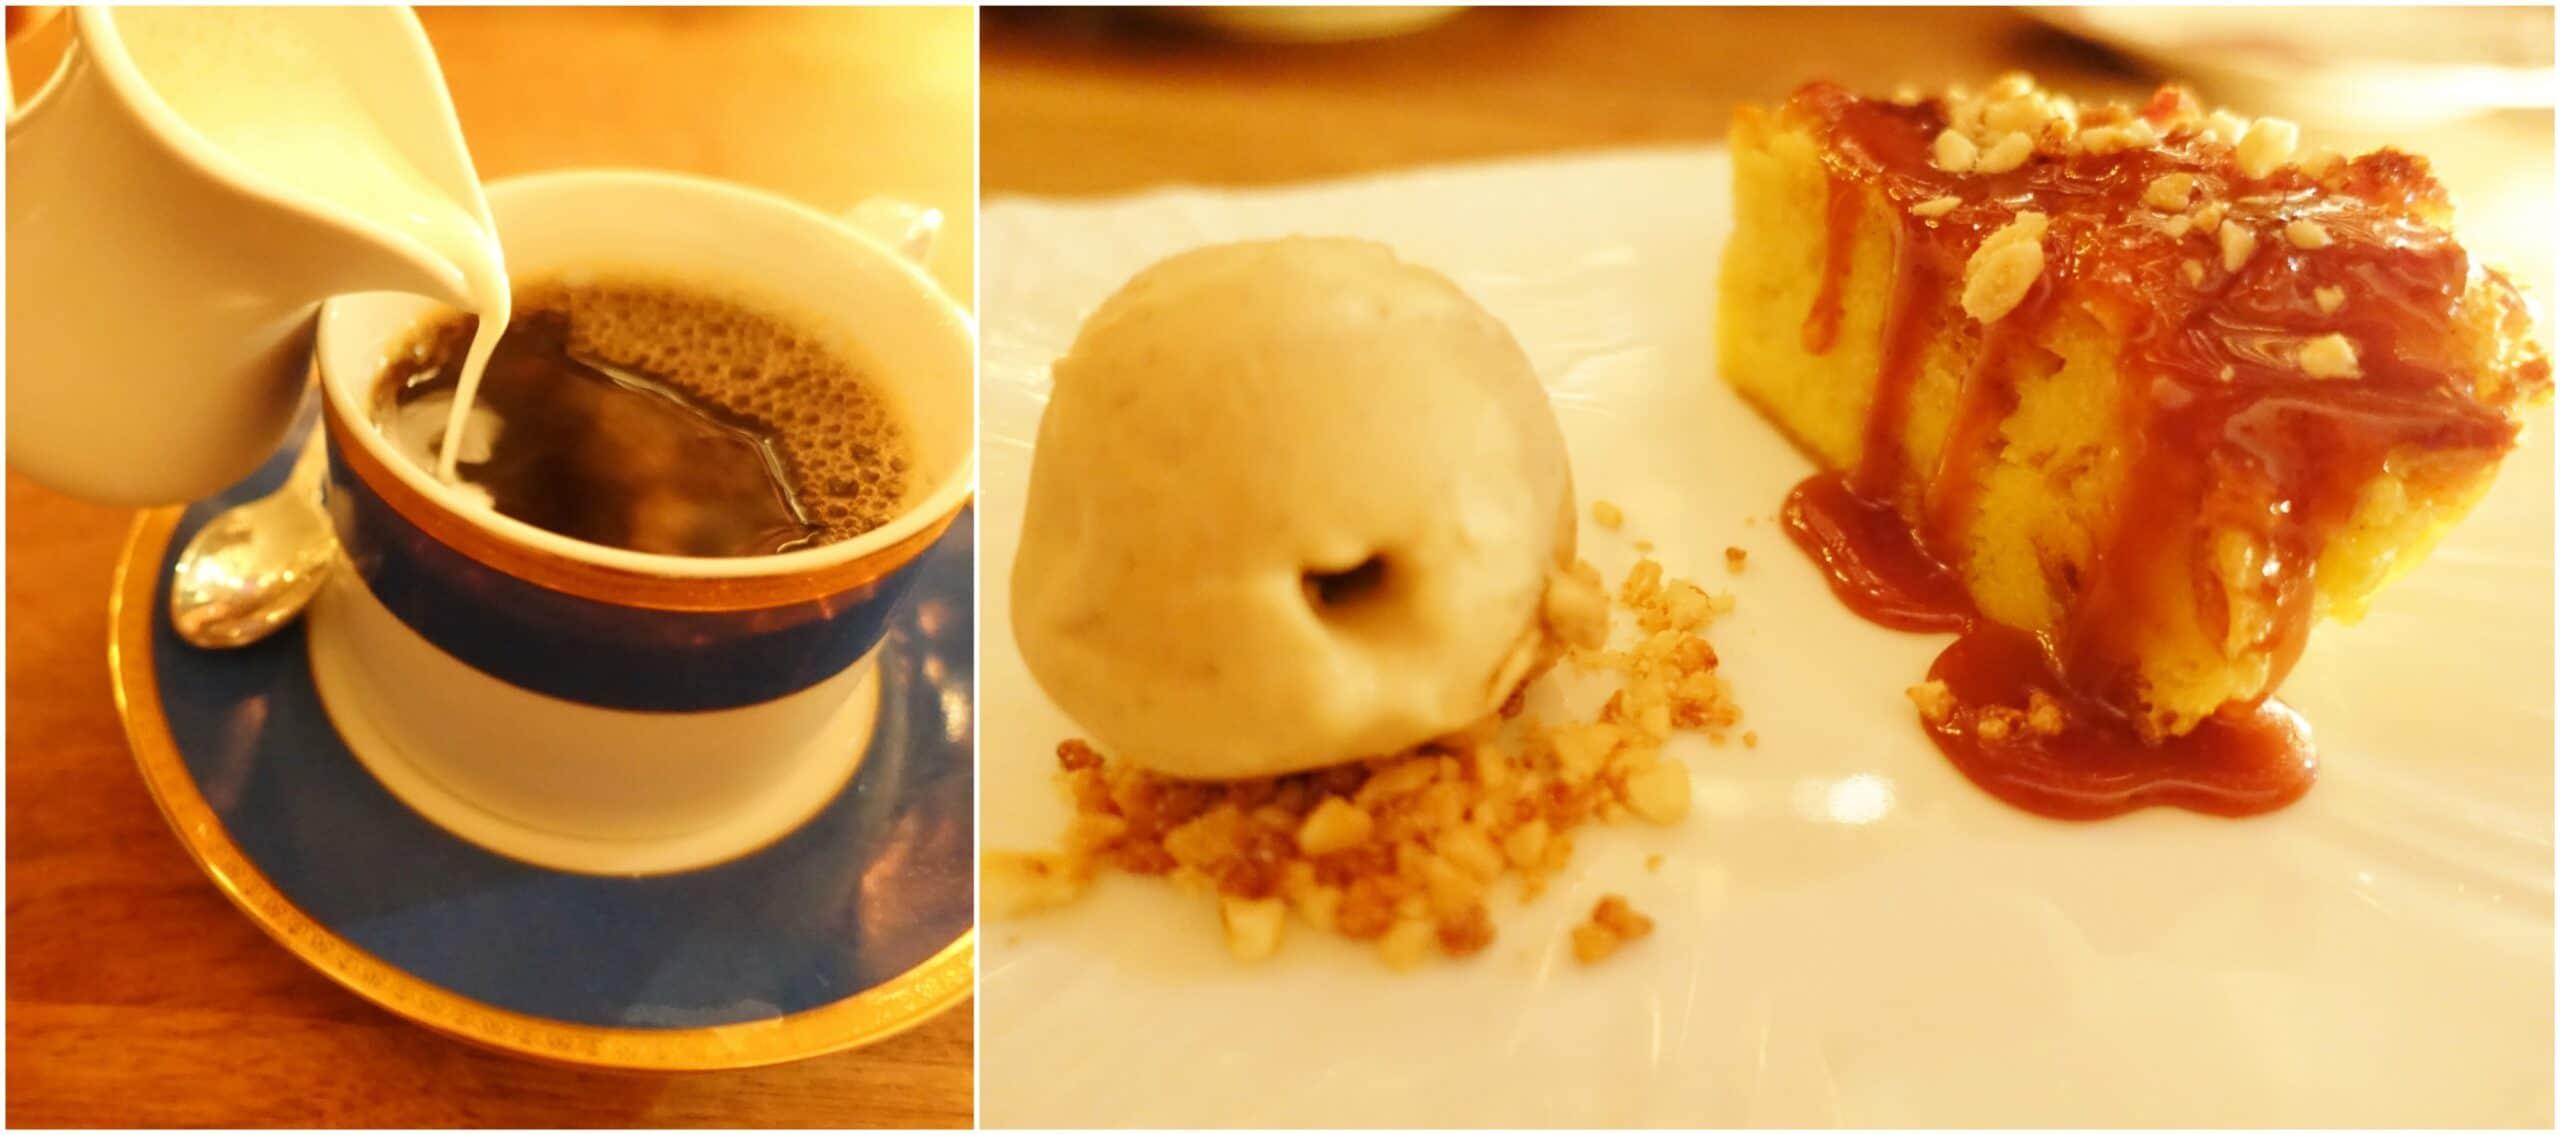 Bread Pudding - The Tasting Kitchen - Venice, Los Angeles, California